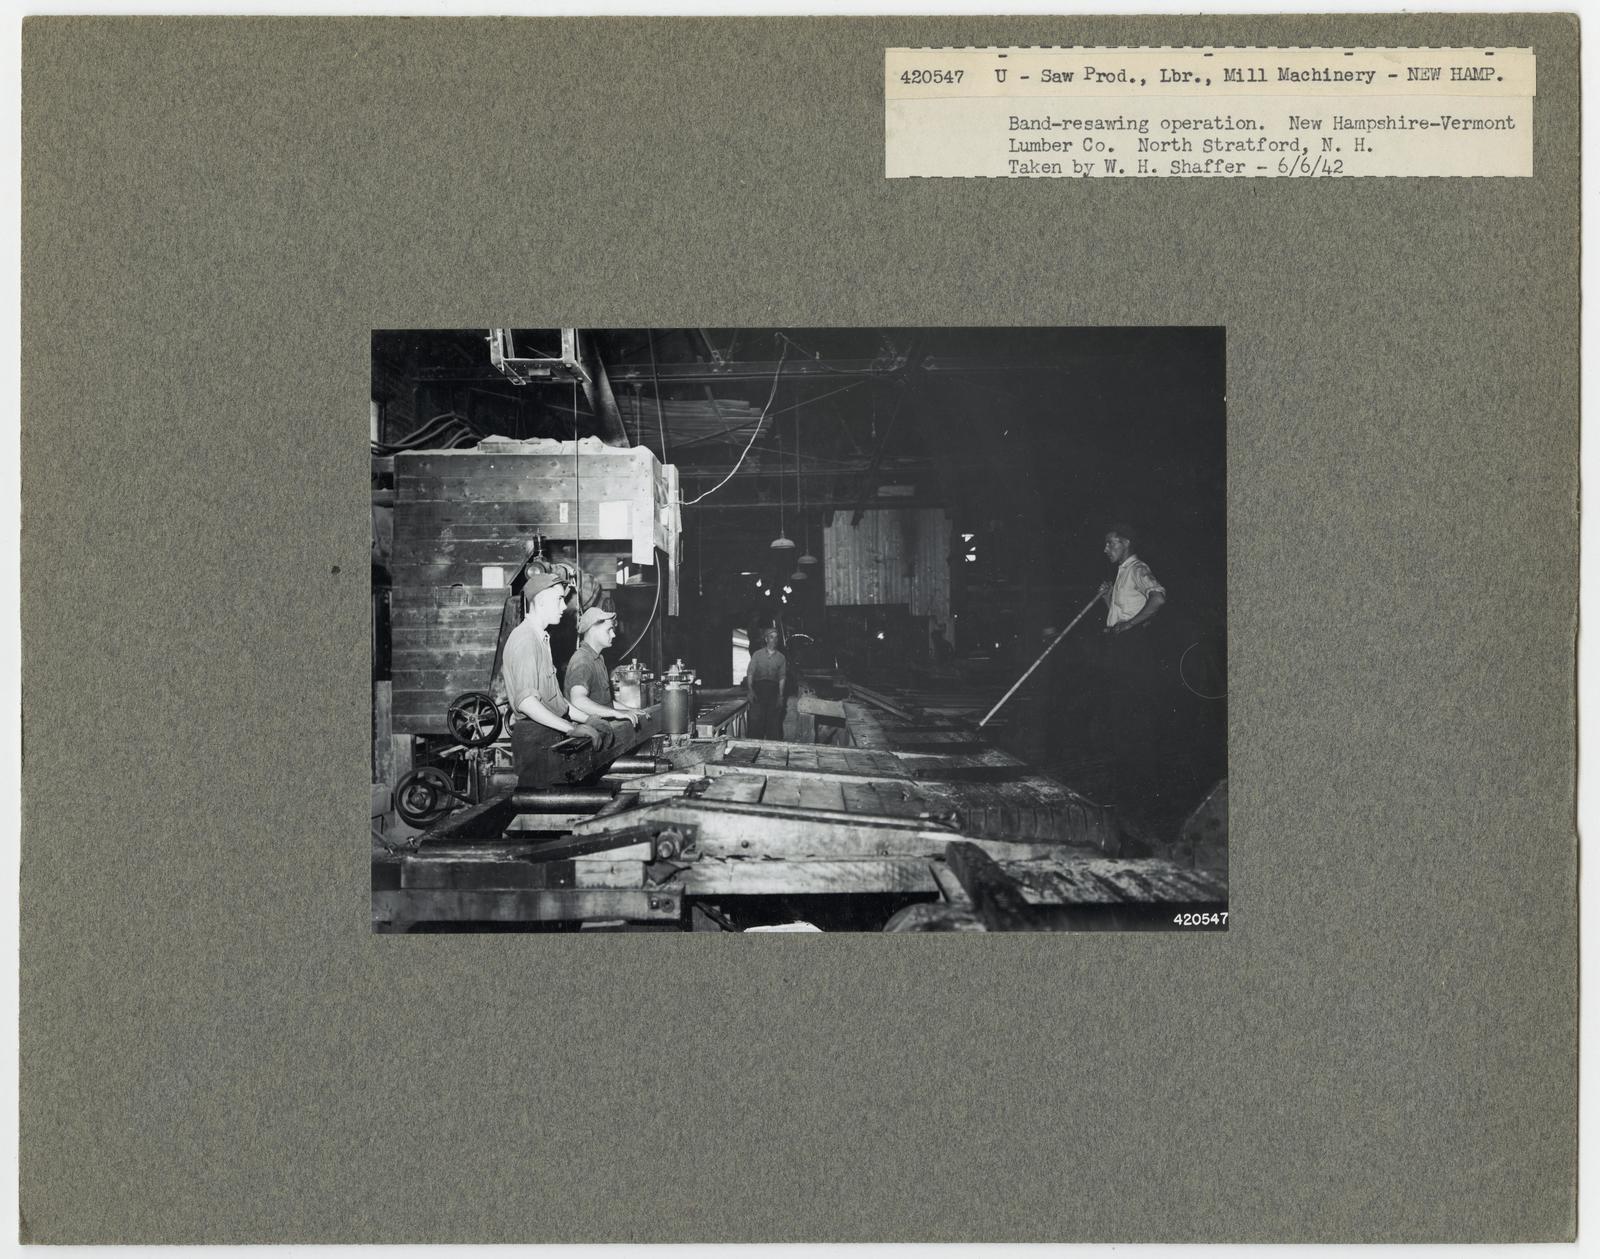 Sawmill Interiors - New Hampshire